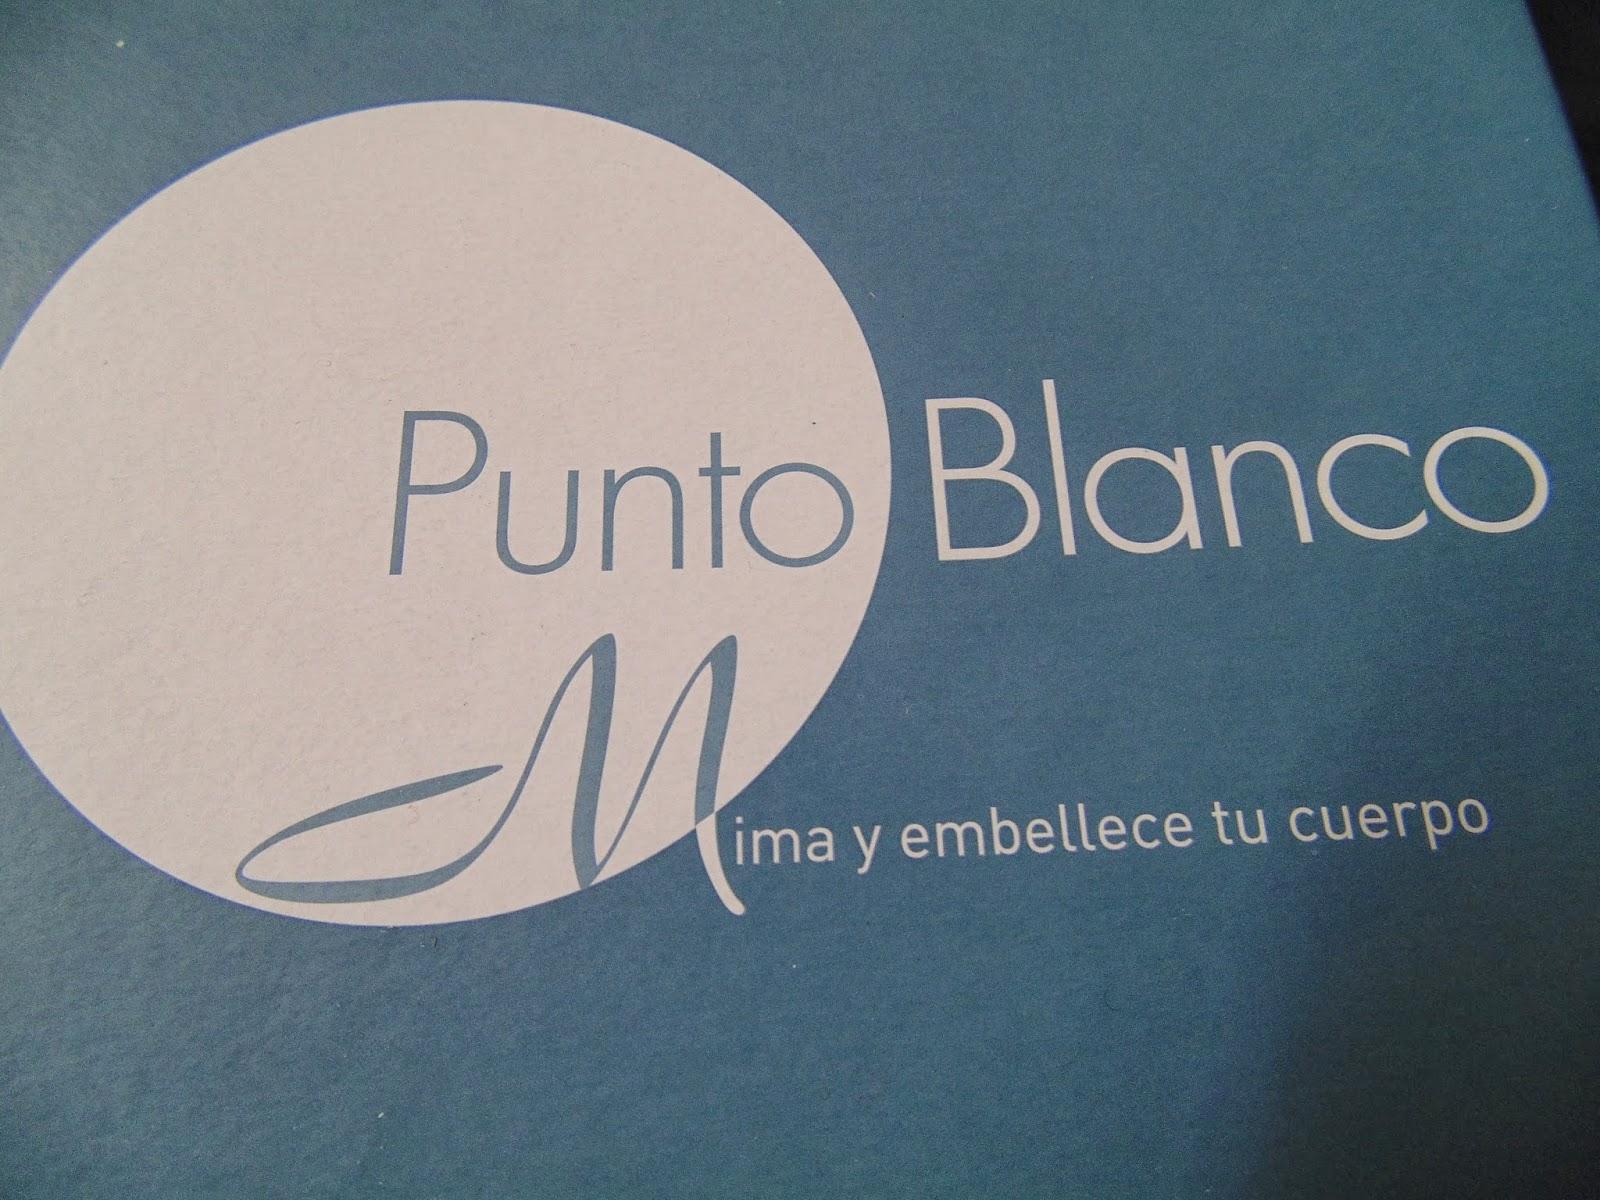 www.puntoblanco.com